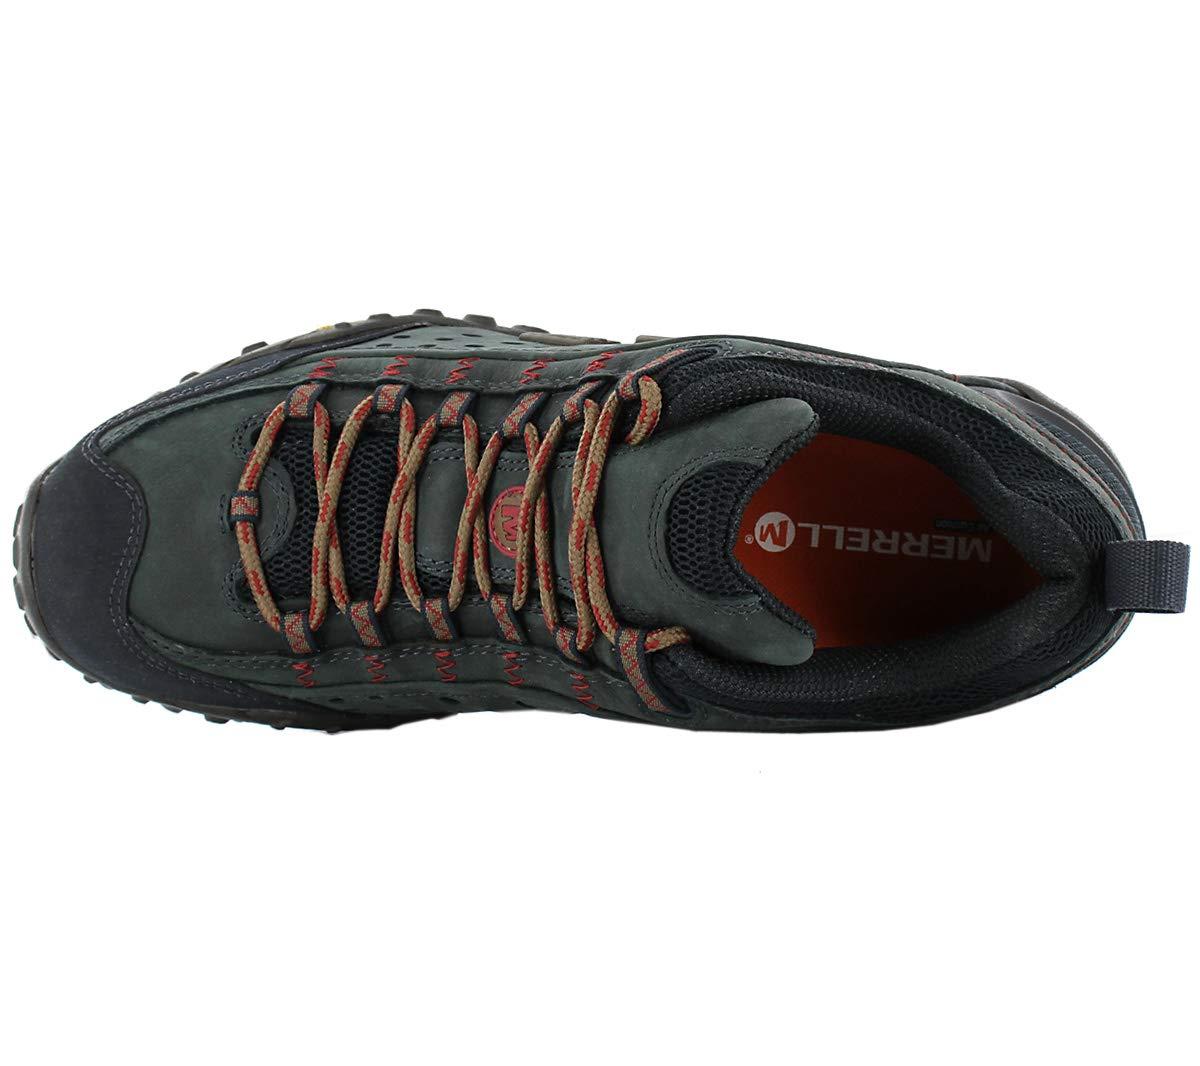 4ef2193e Merrell Men's Intercept Low Rise Hiking Shoes - UKsportsOutdoors